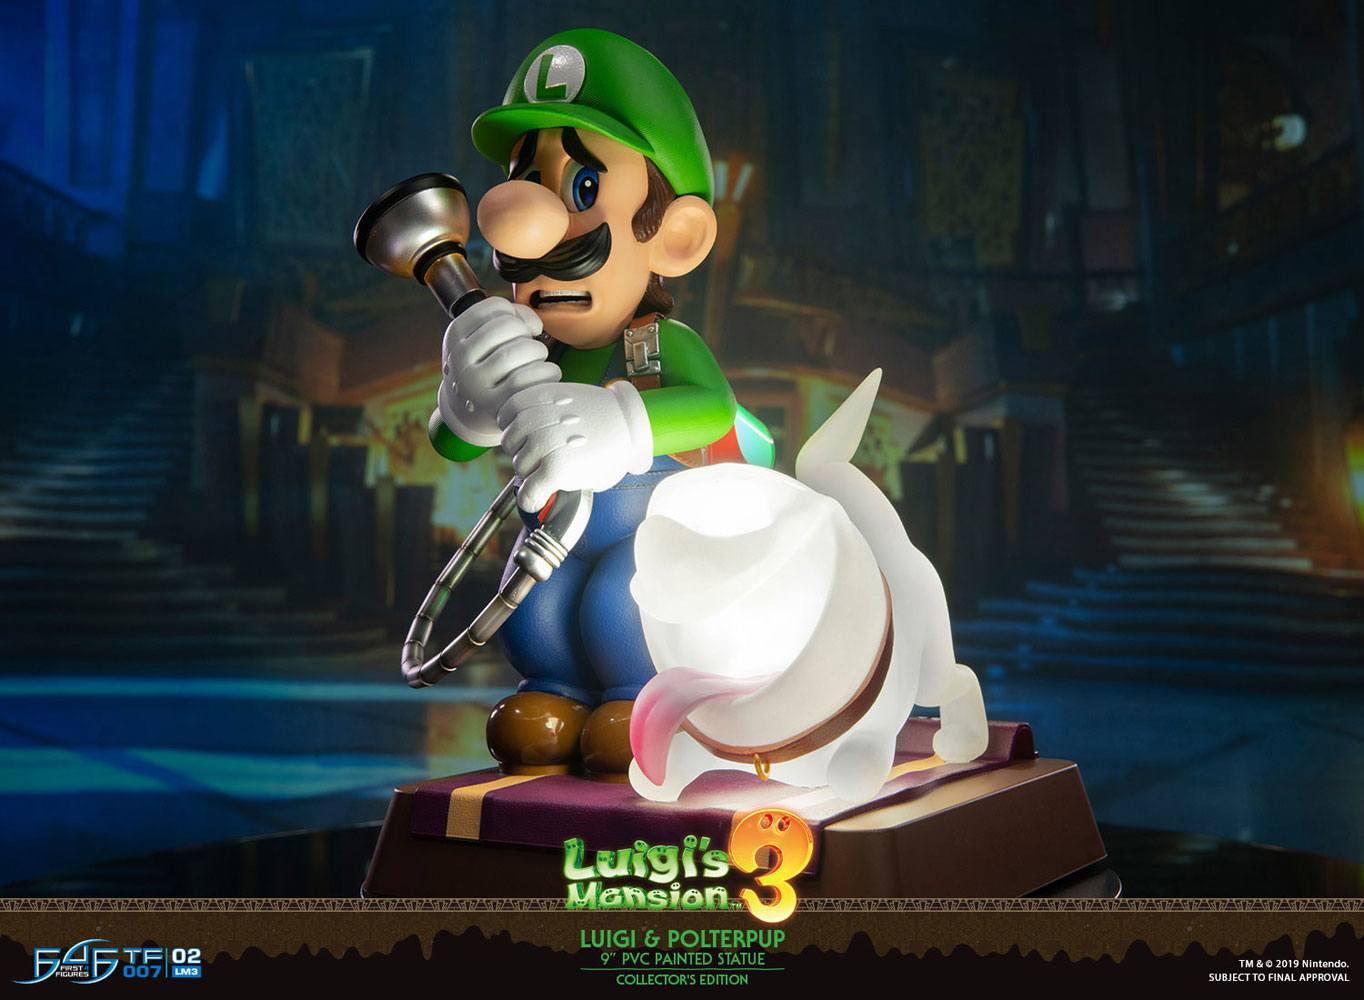 Luigi's Mansion 3 PVC Statue Luigi & Polterpup Collector's Edition 23 cm